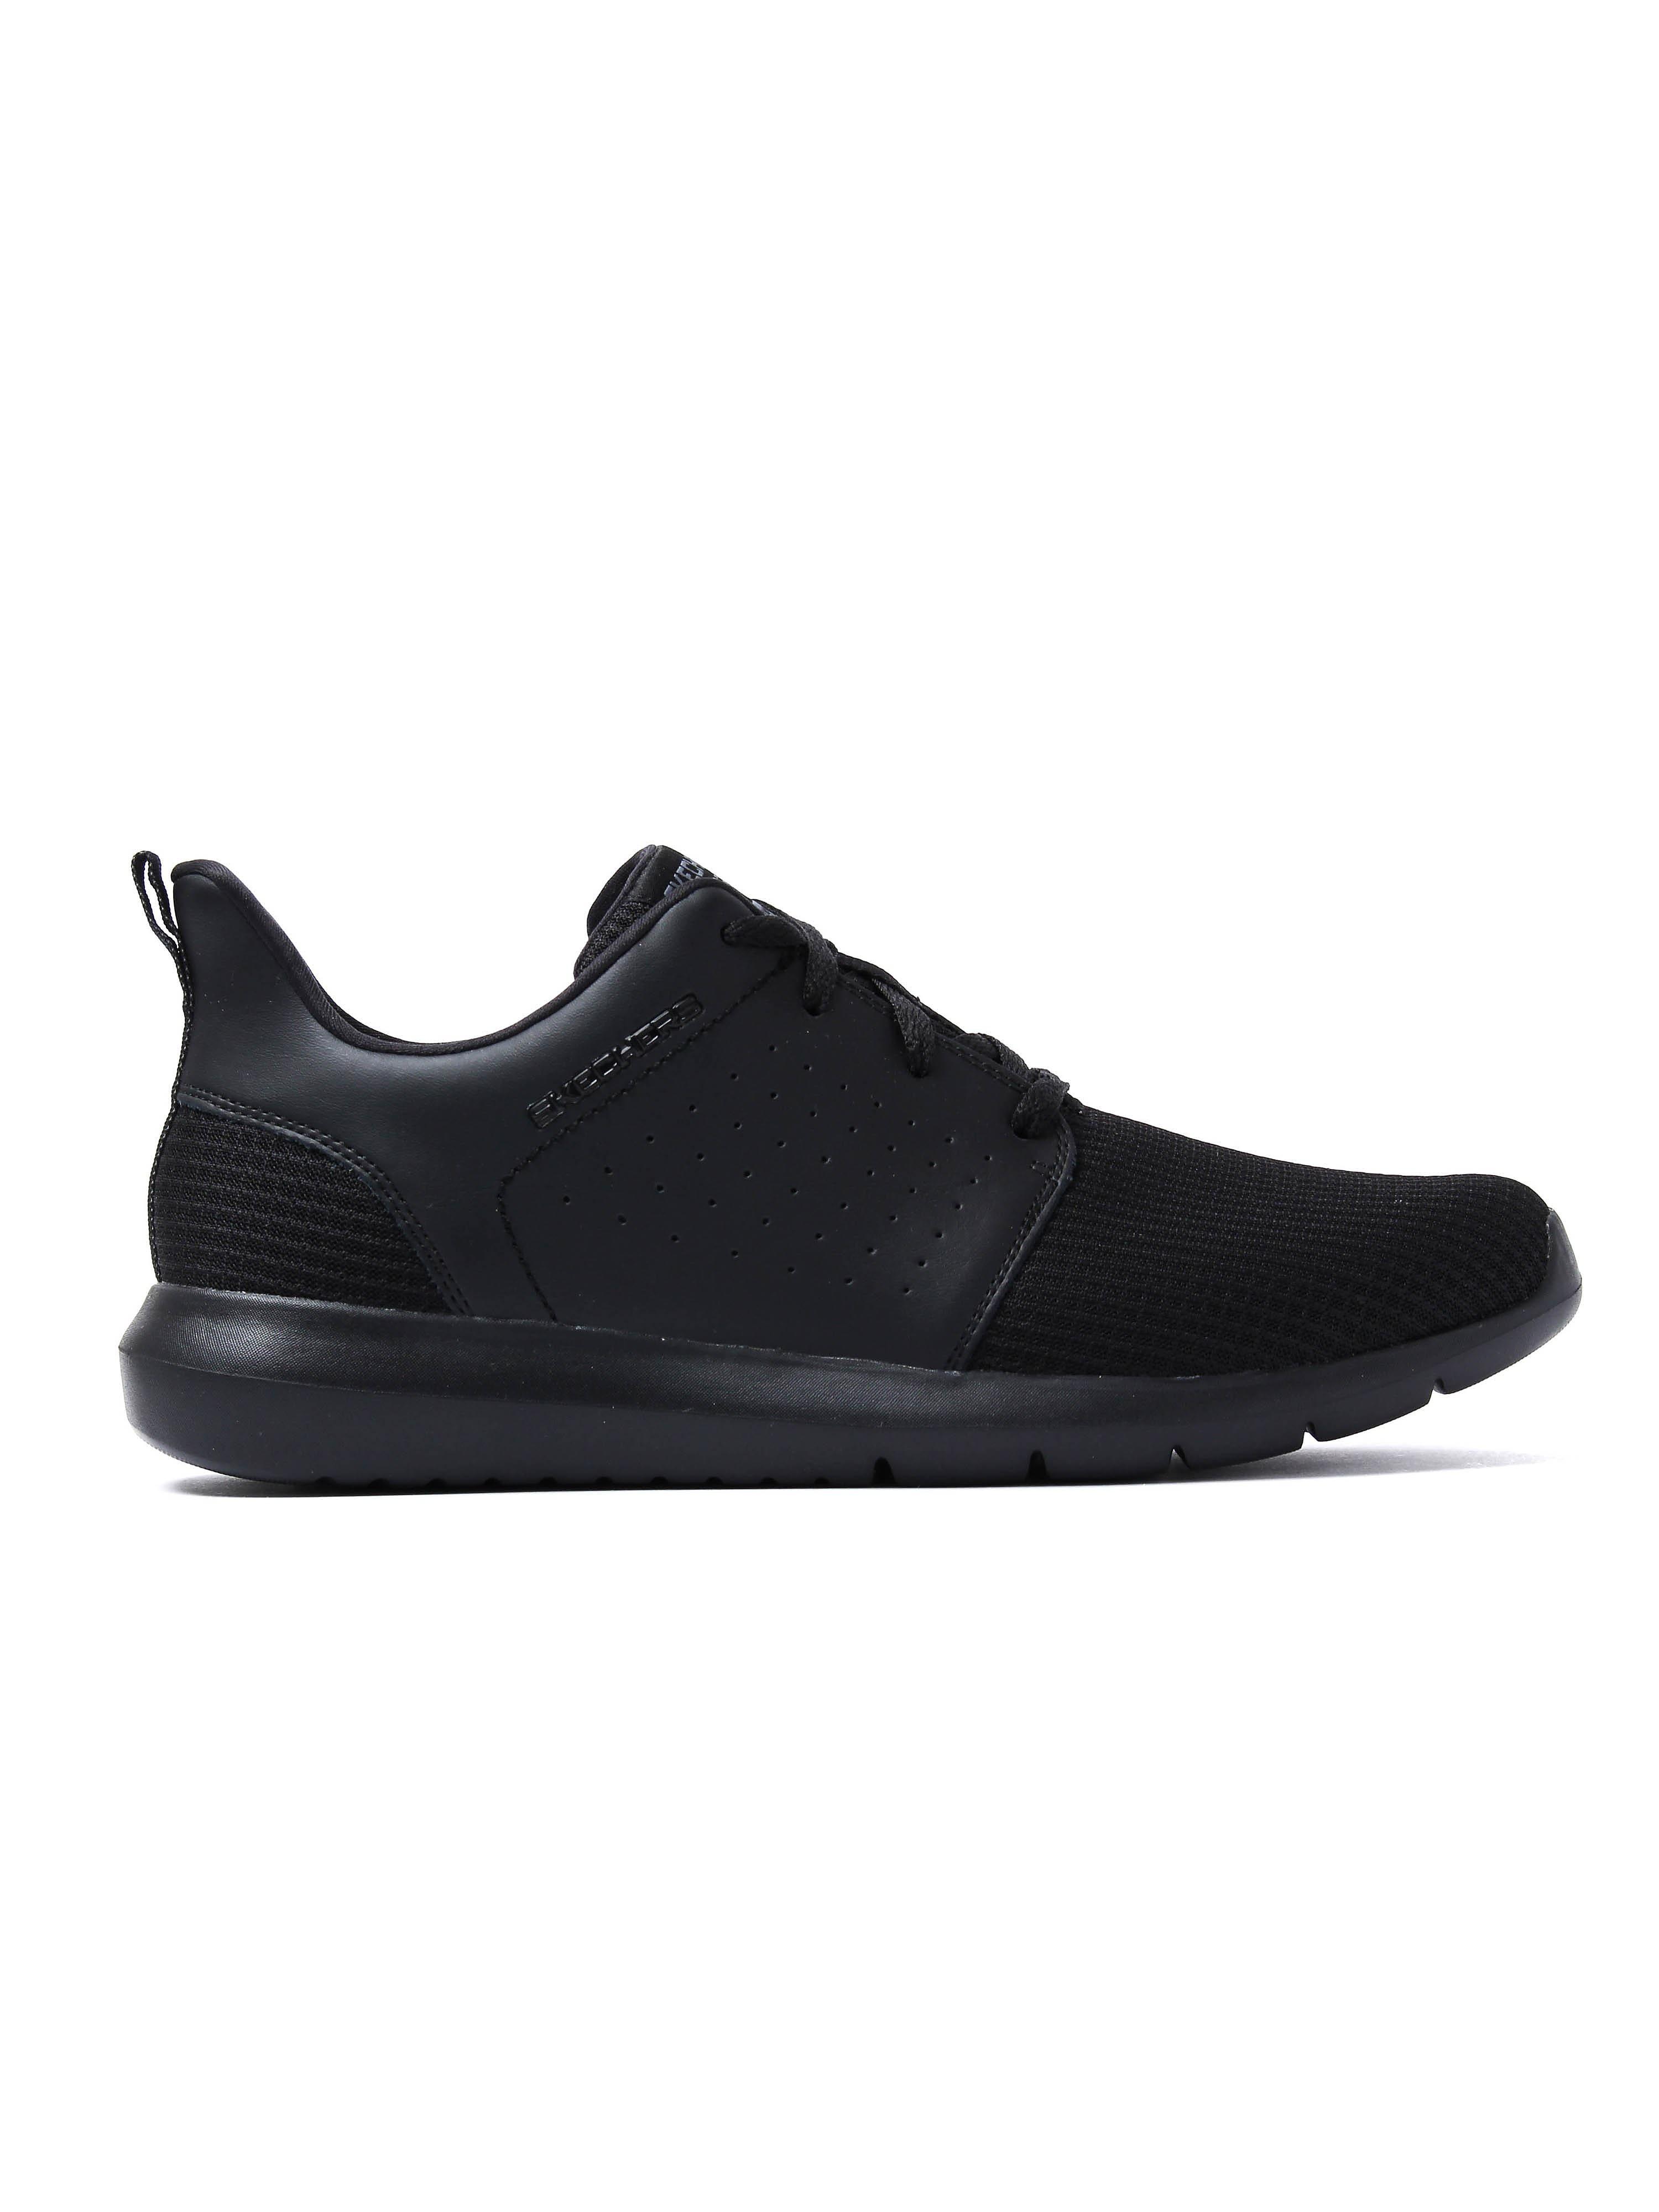 Skechers Men's Fore Flex Trainers - Black